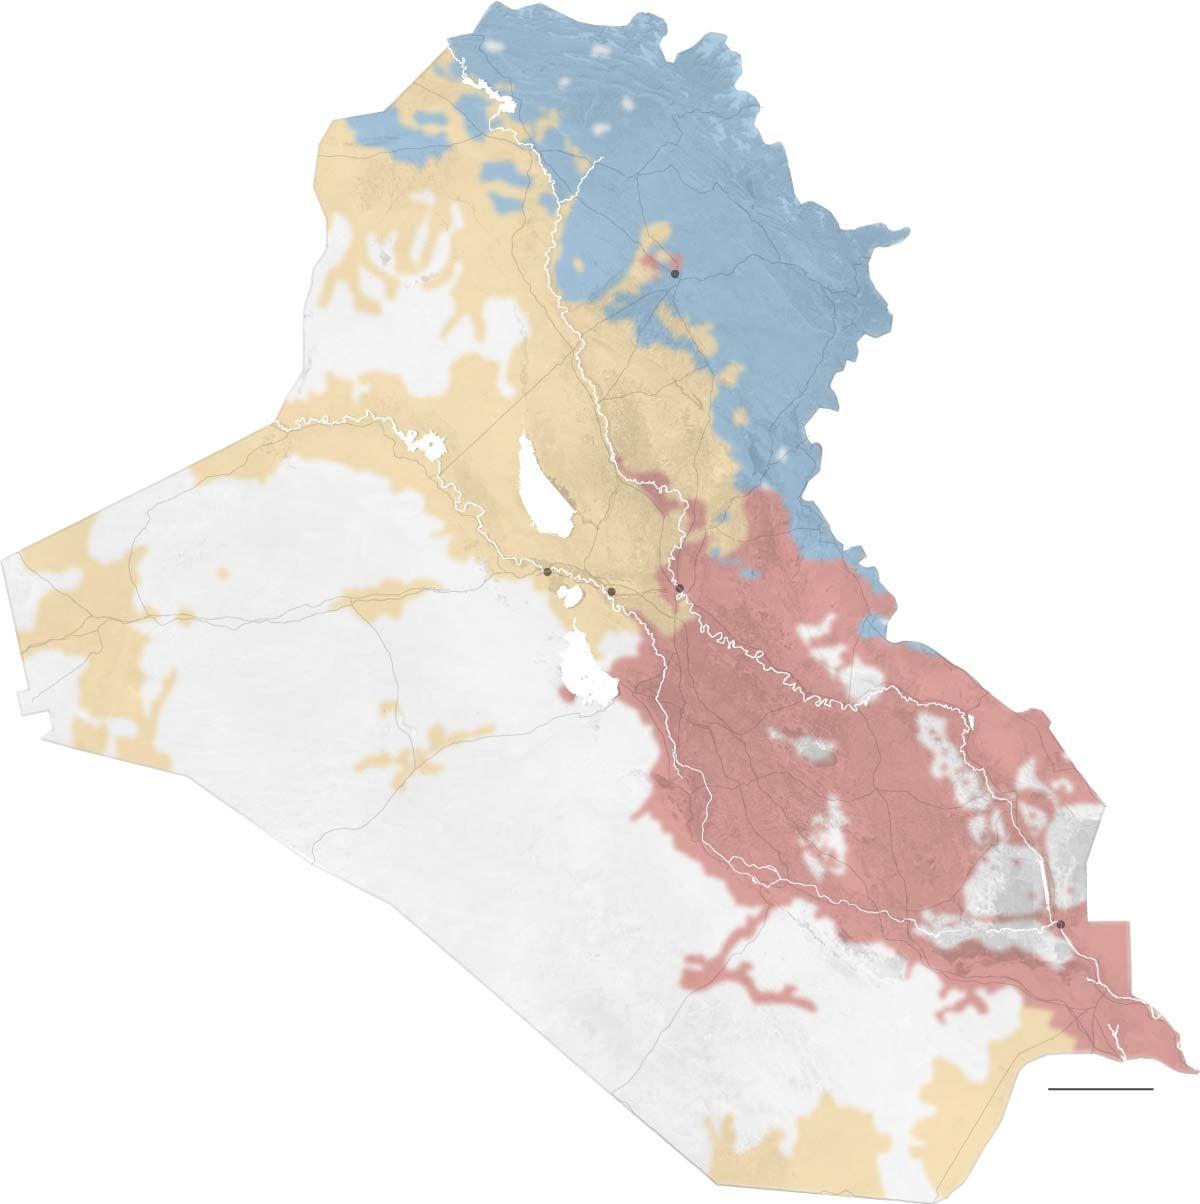 Iraqi army Iraqi Army Retakes Government Complex